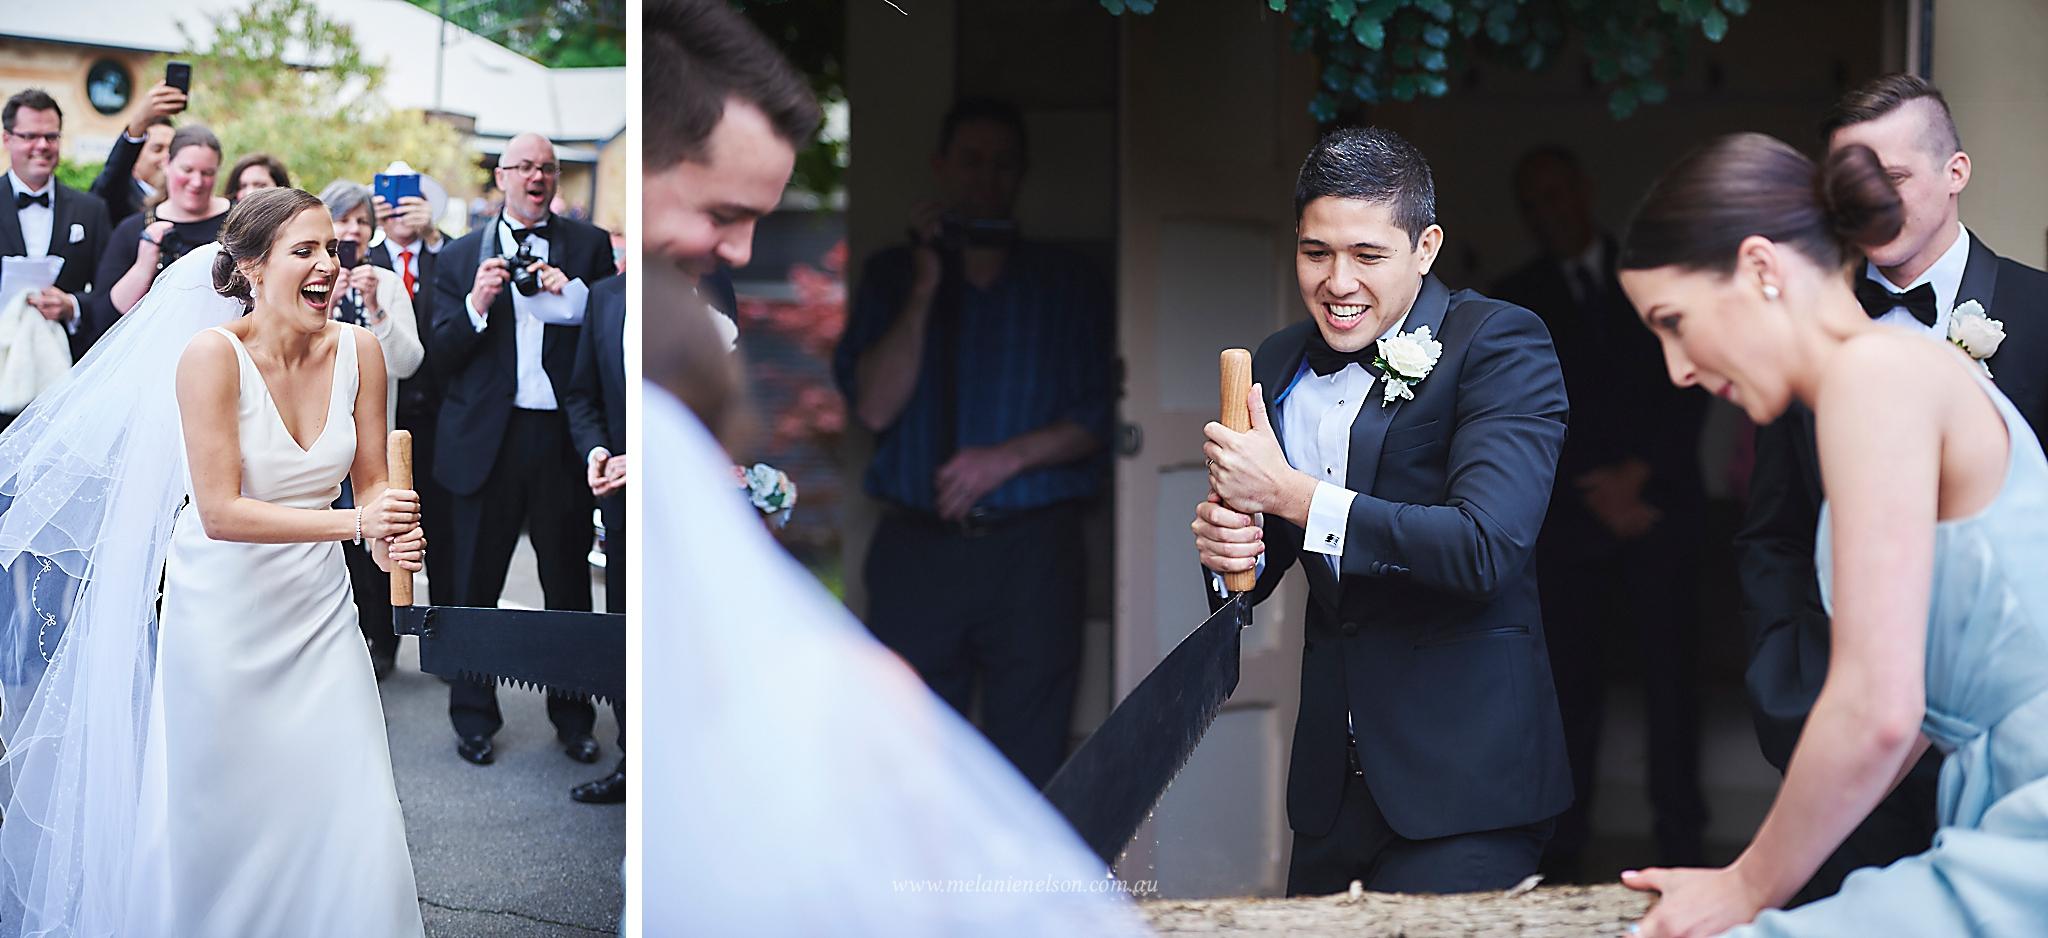 mount_lofty_wedding_0046.jpg